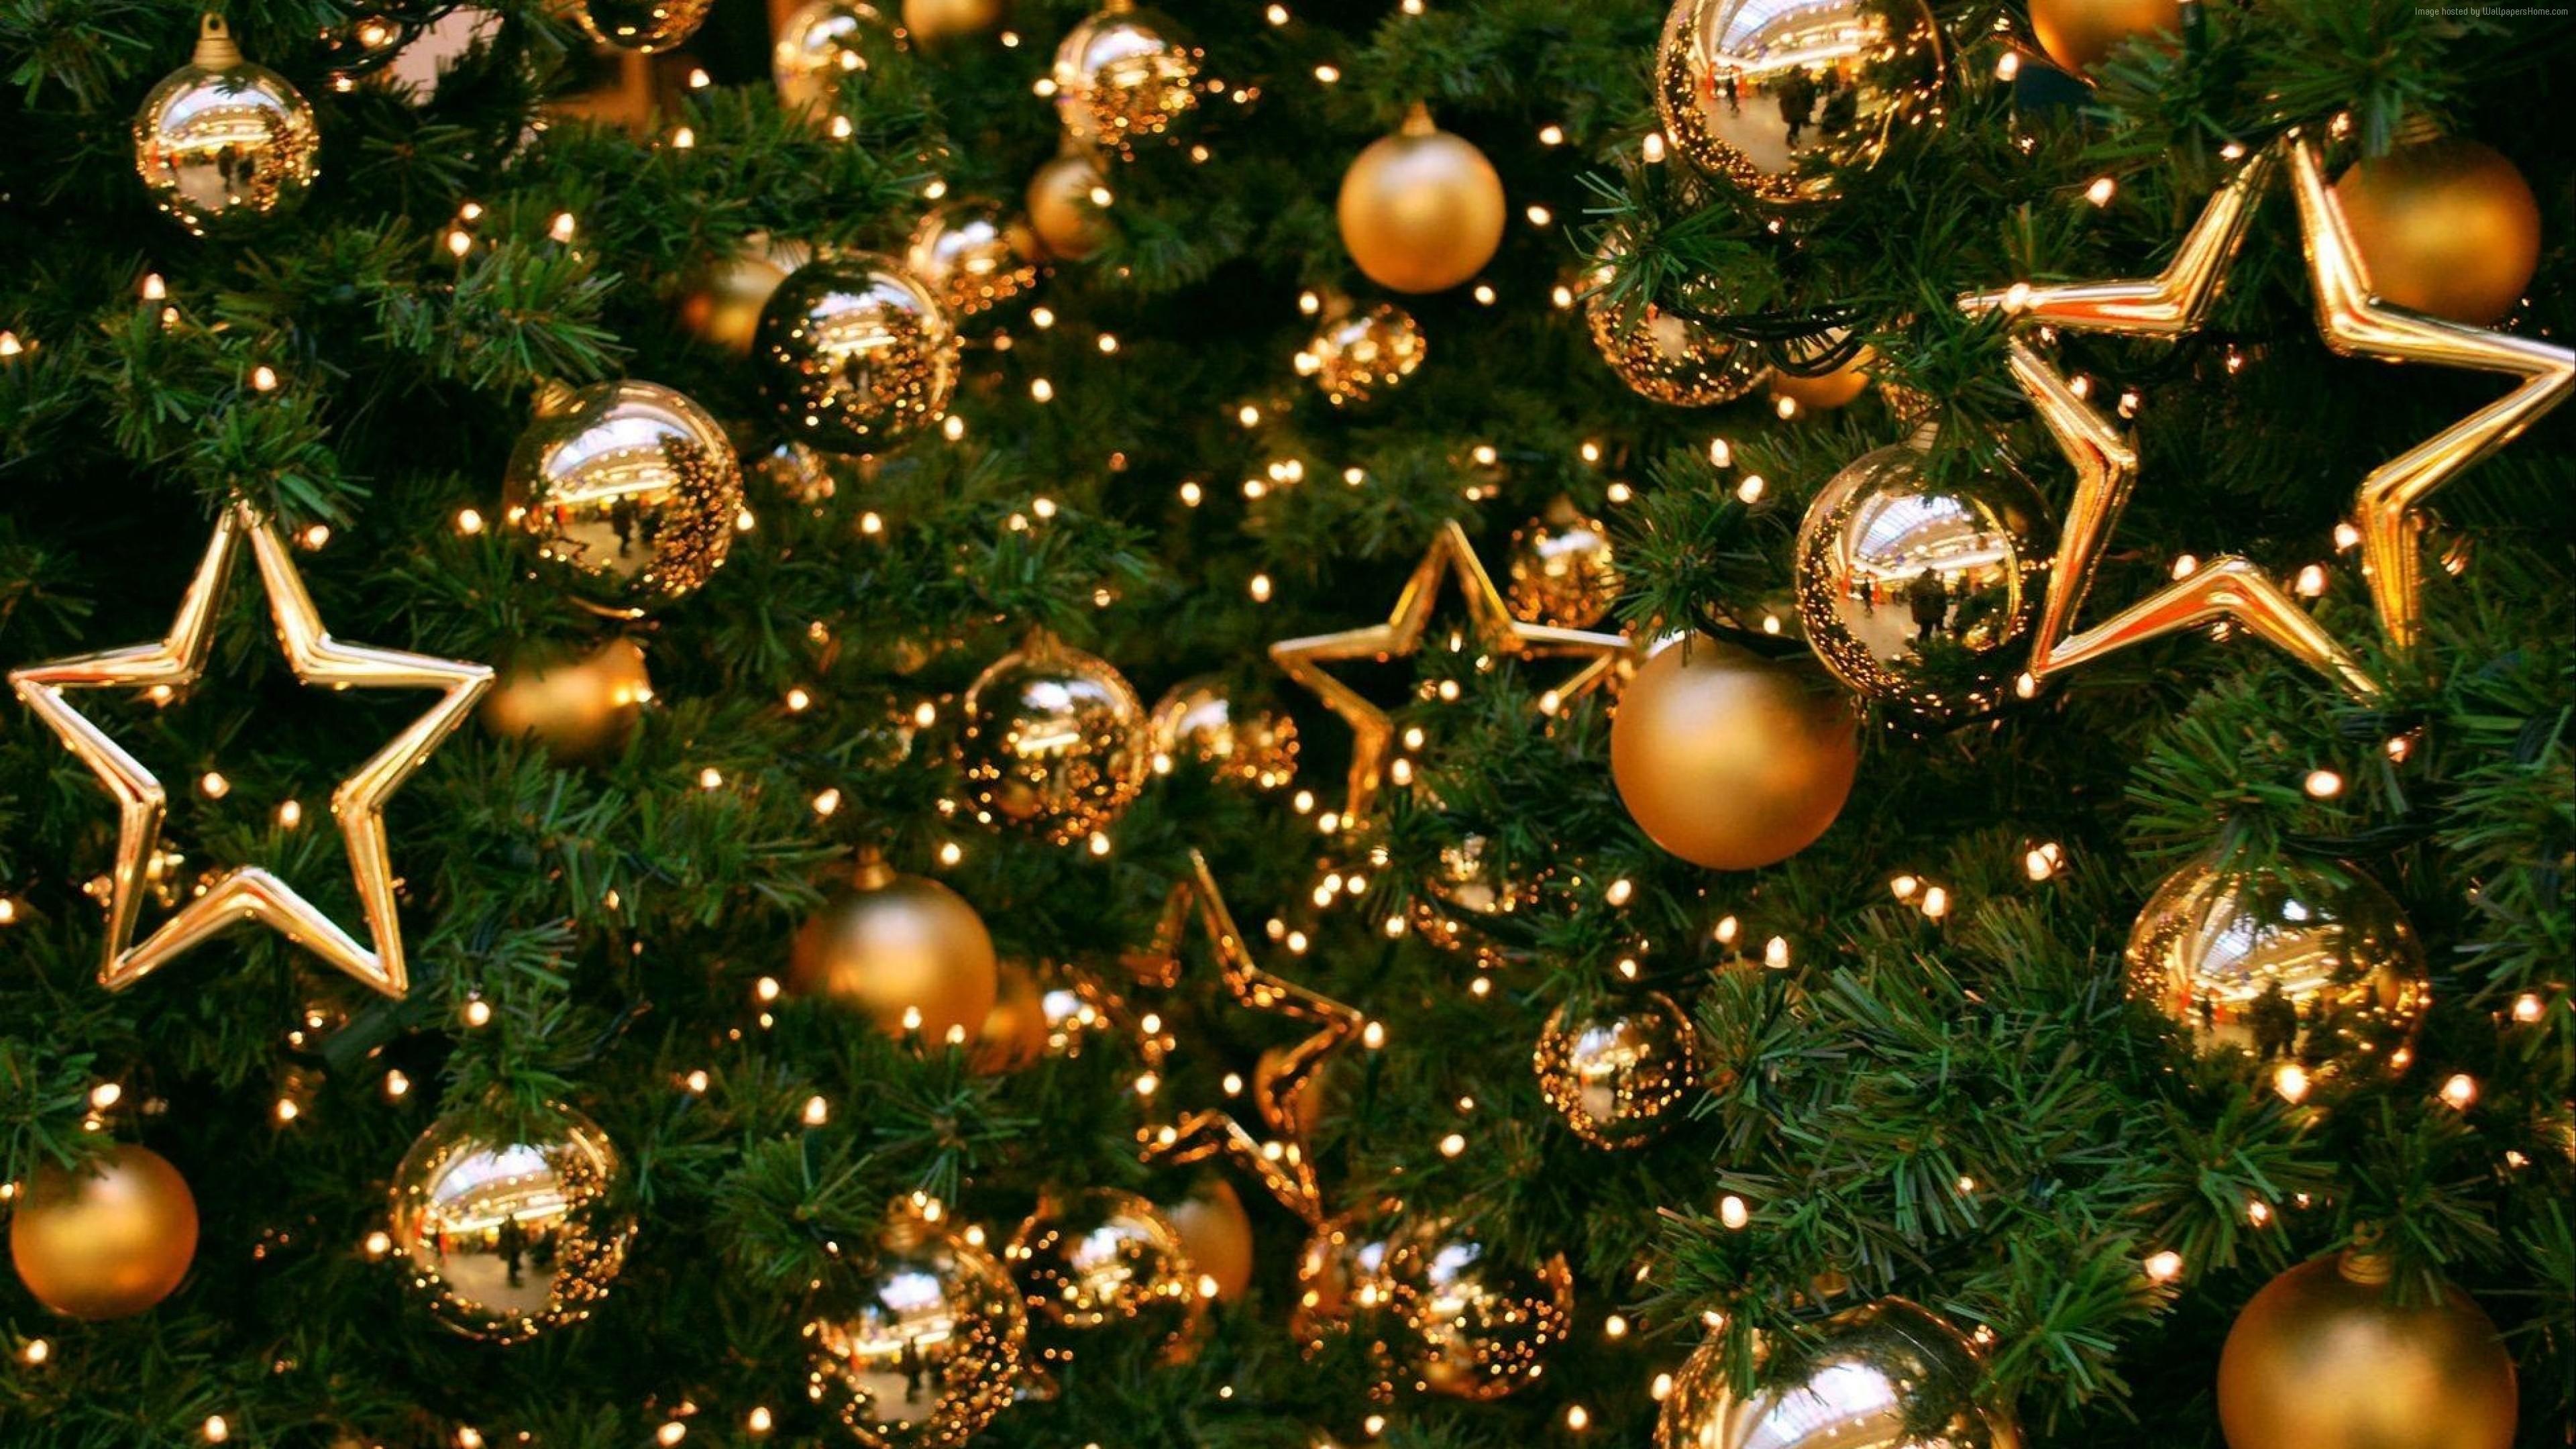 wallpaper christmas, new year, toys, fir-tree, balls, decorations